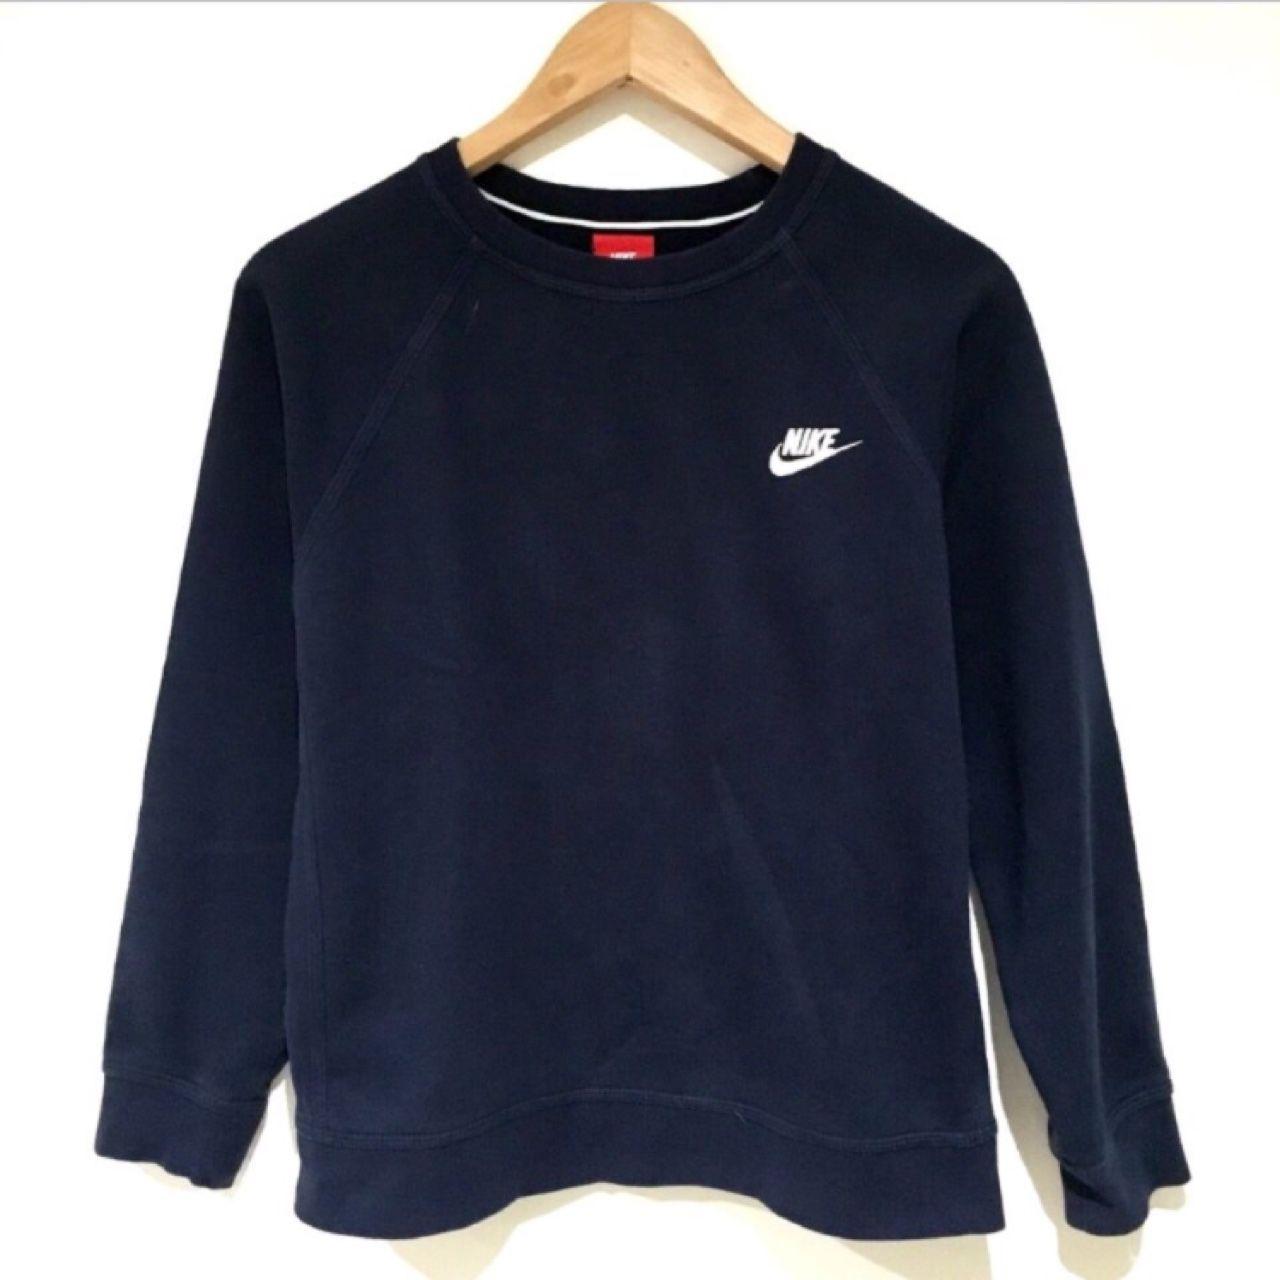 Nike sweatshirt jumper 6169a8bba